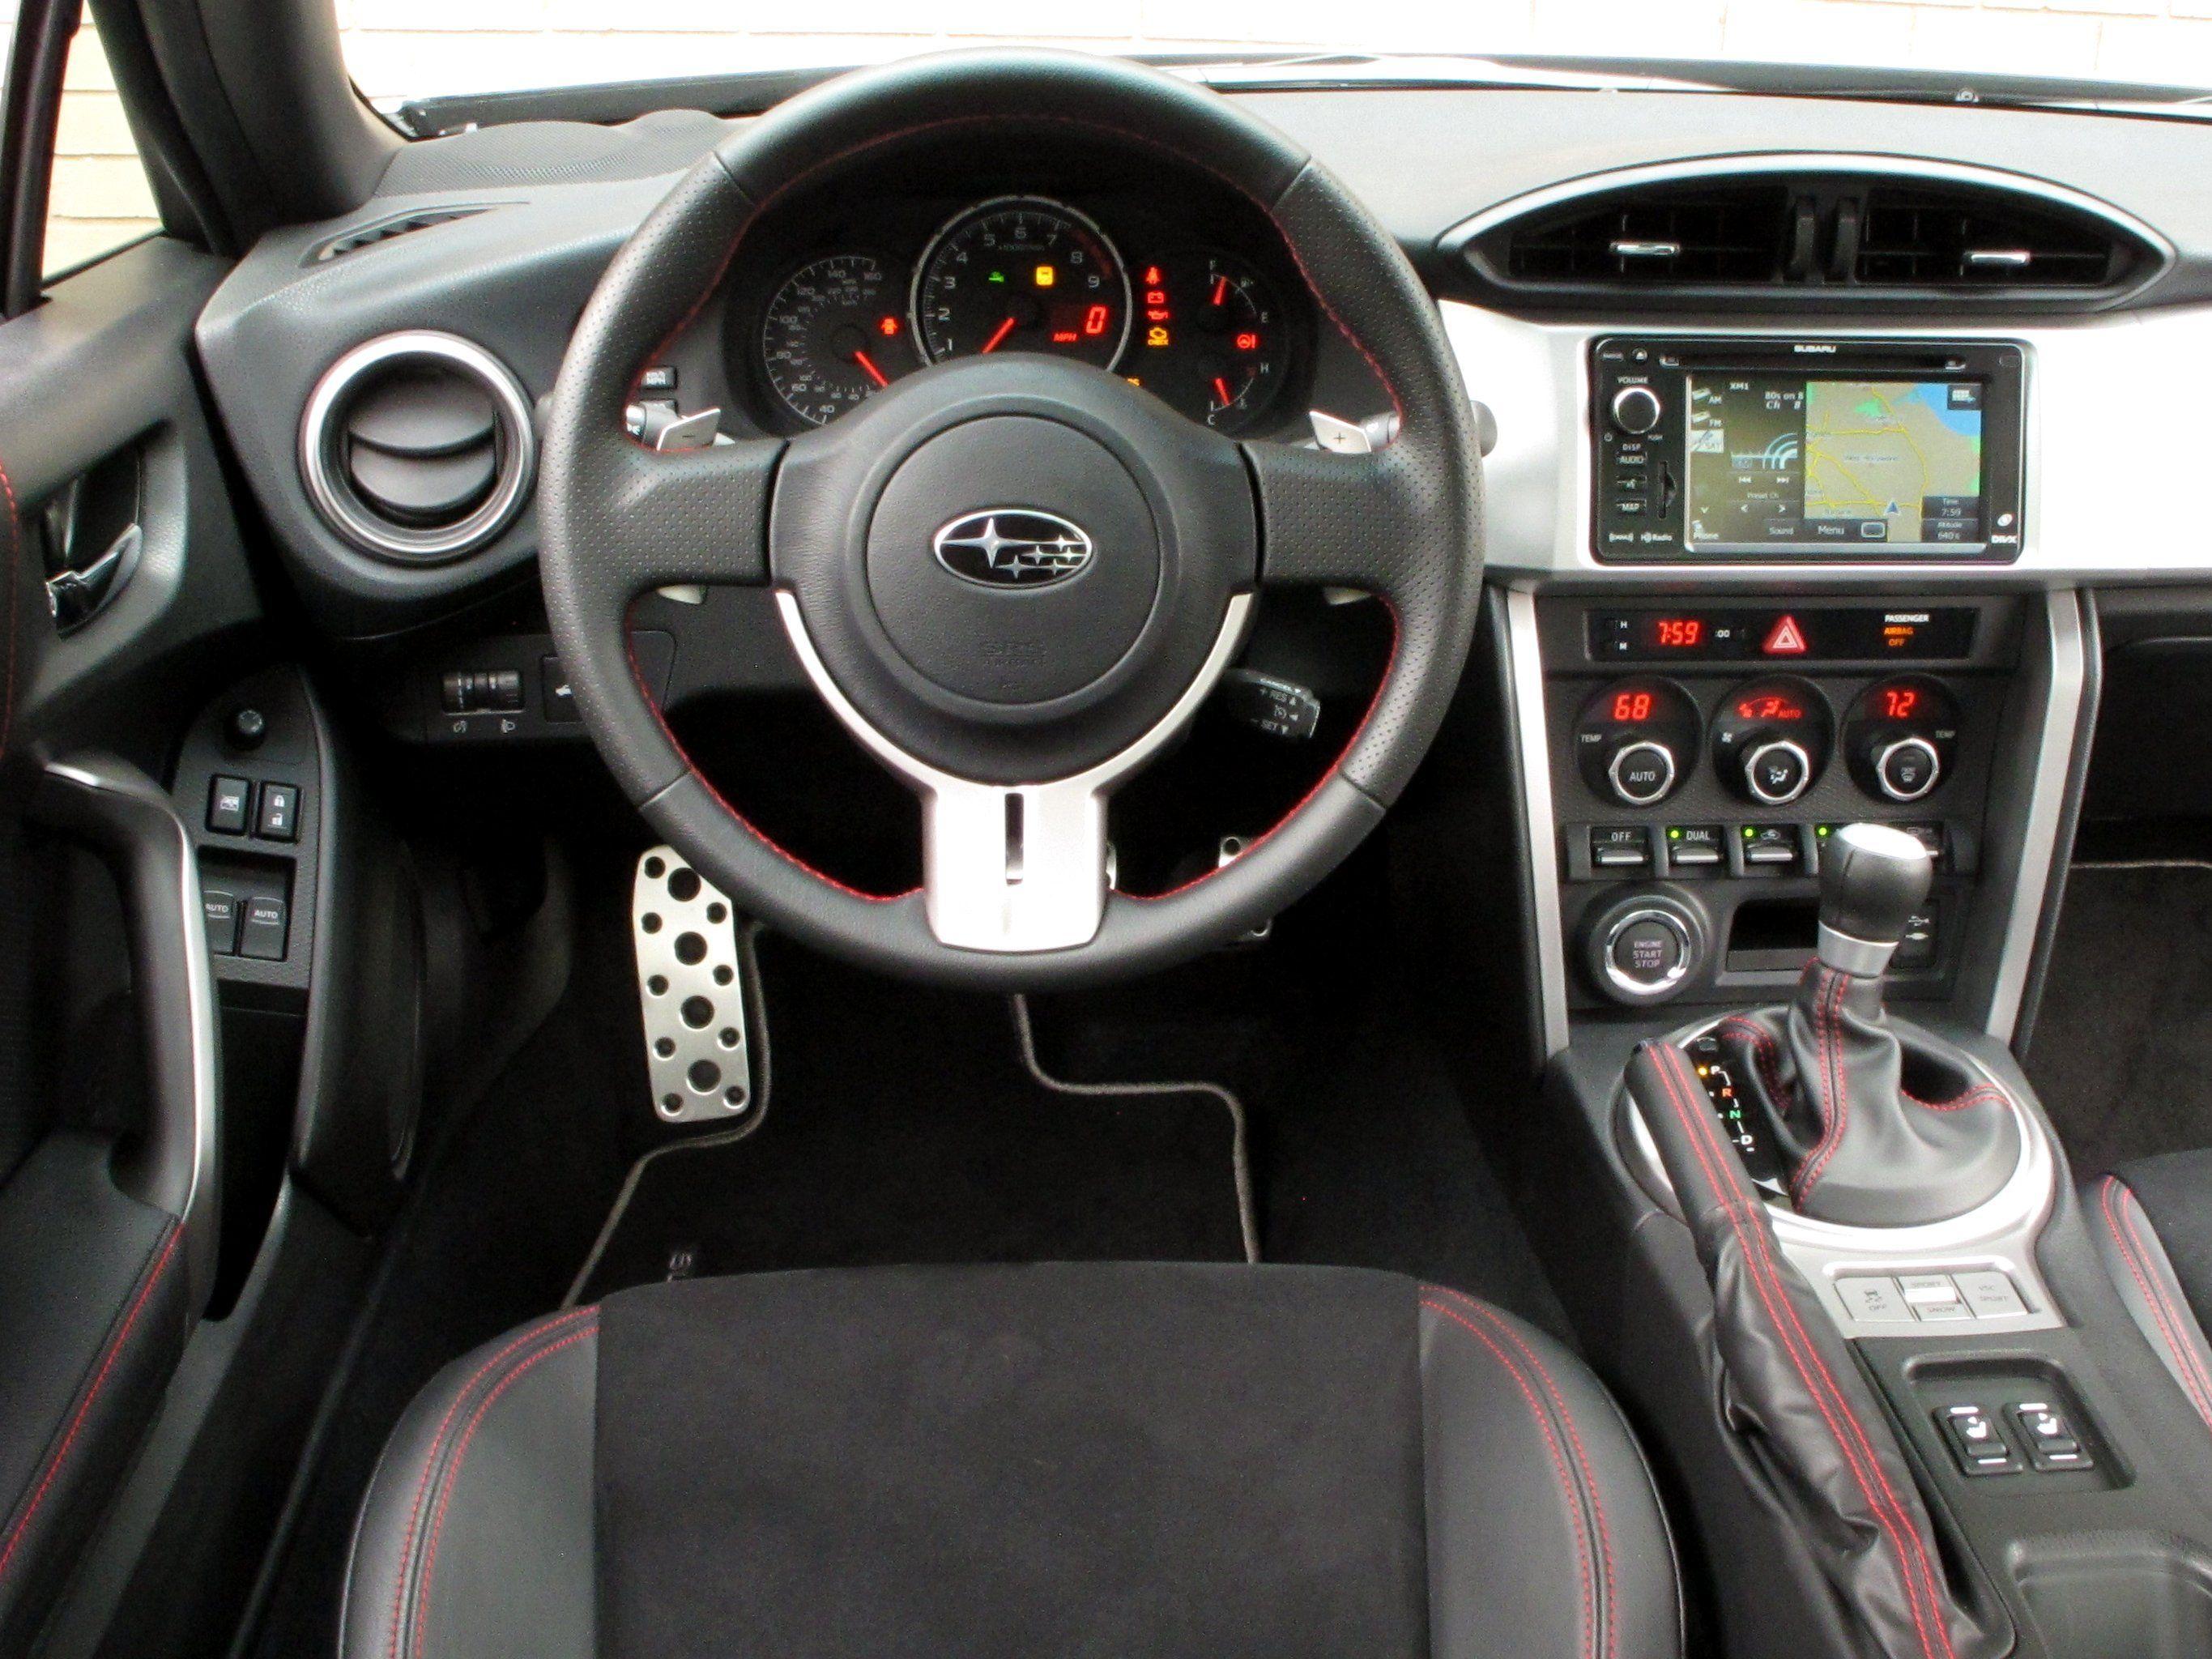 101 best subaru brz images on pinterest subaru dream cars and subaru brz interior vanachro Images